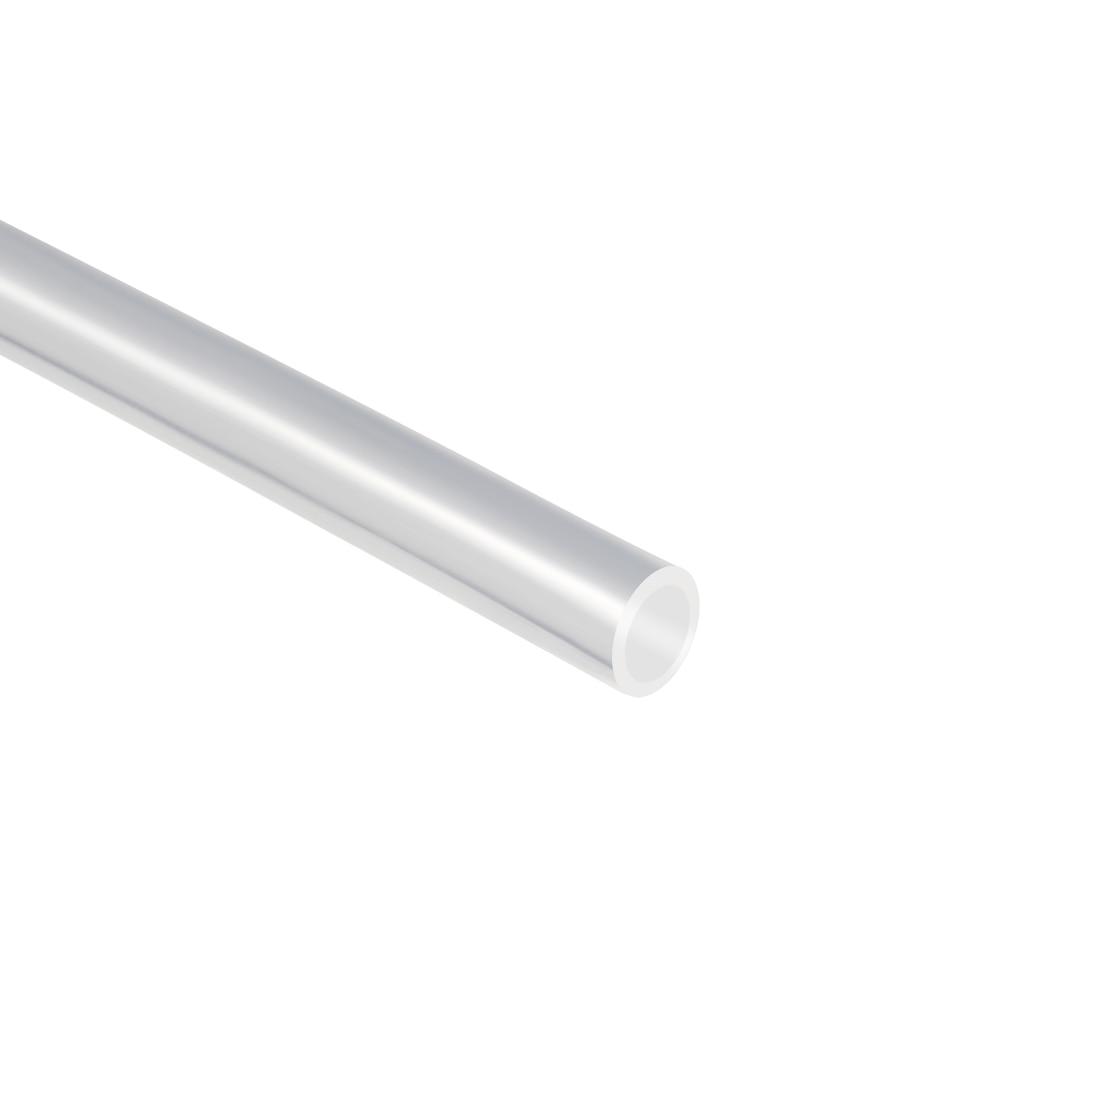 Uxcell PTFE трубка длина трубы прозрачная 3 мм ID 4 мм OD1m